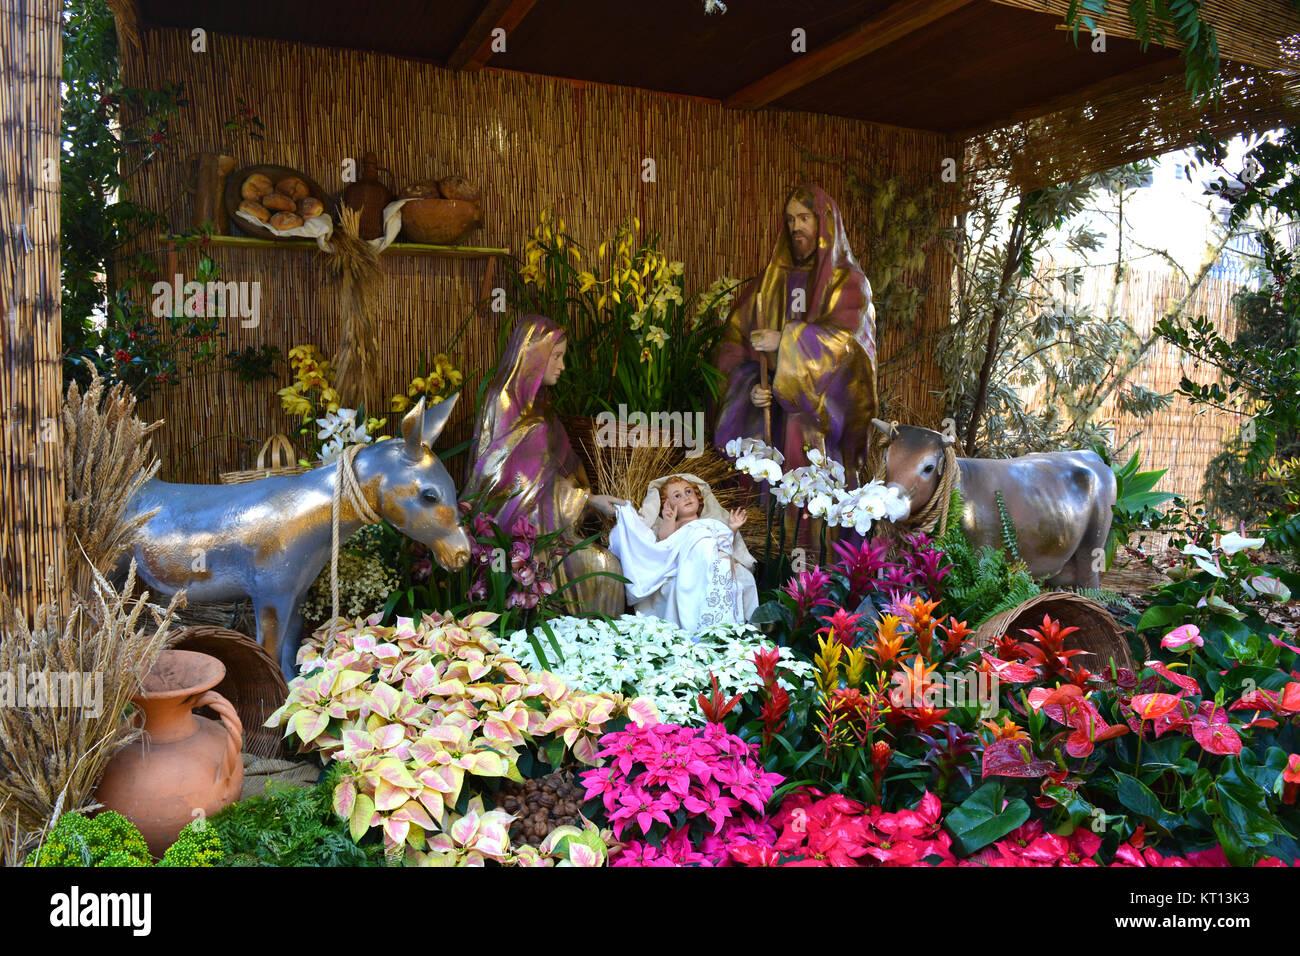 Nativity scene, or presépios, in the Avenida Arriaga, Funchal, Madeira, Portugal - Stock Image